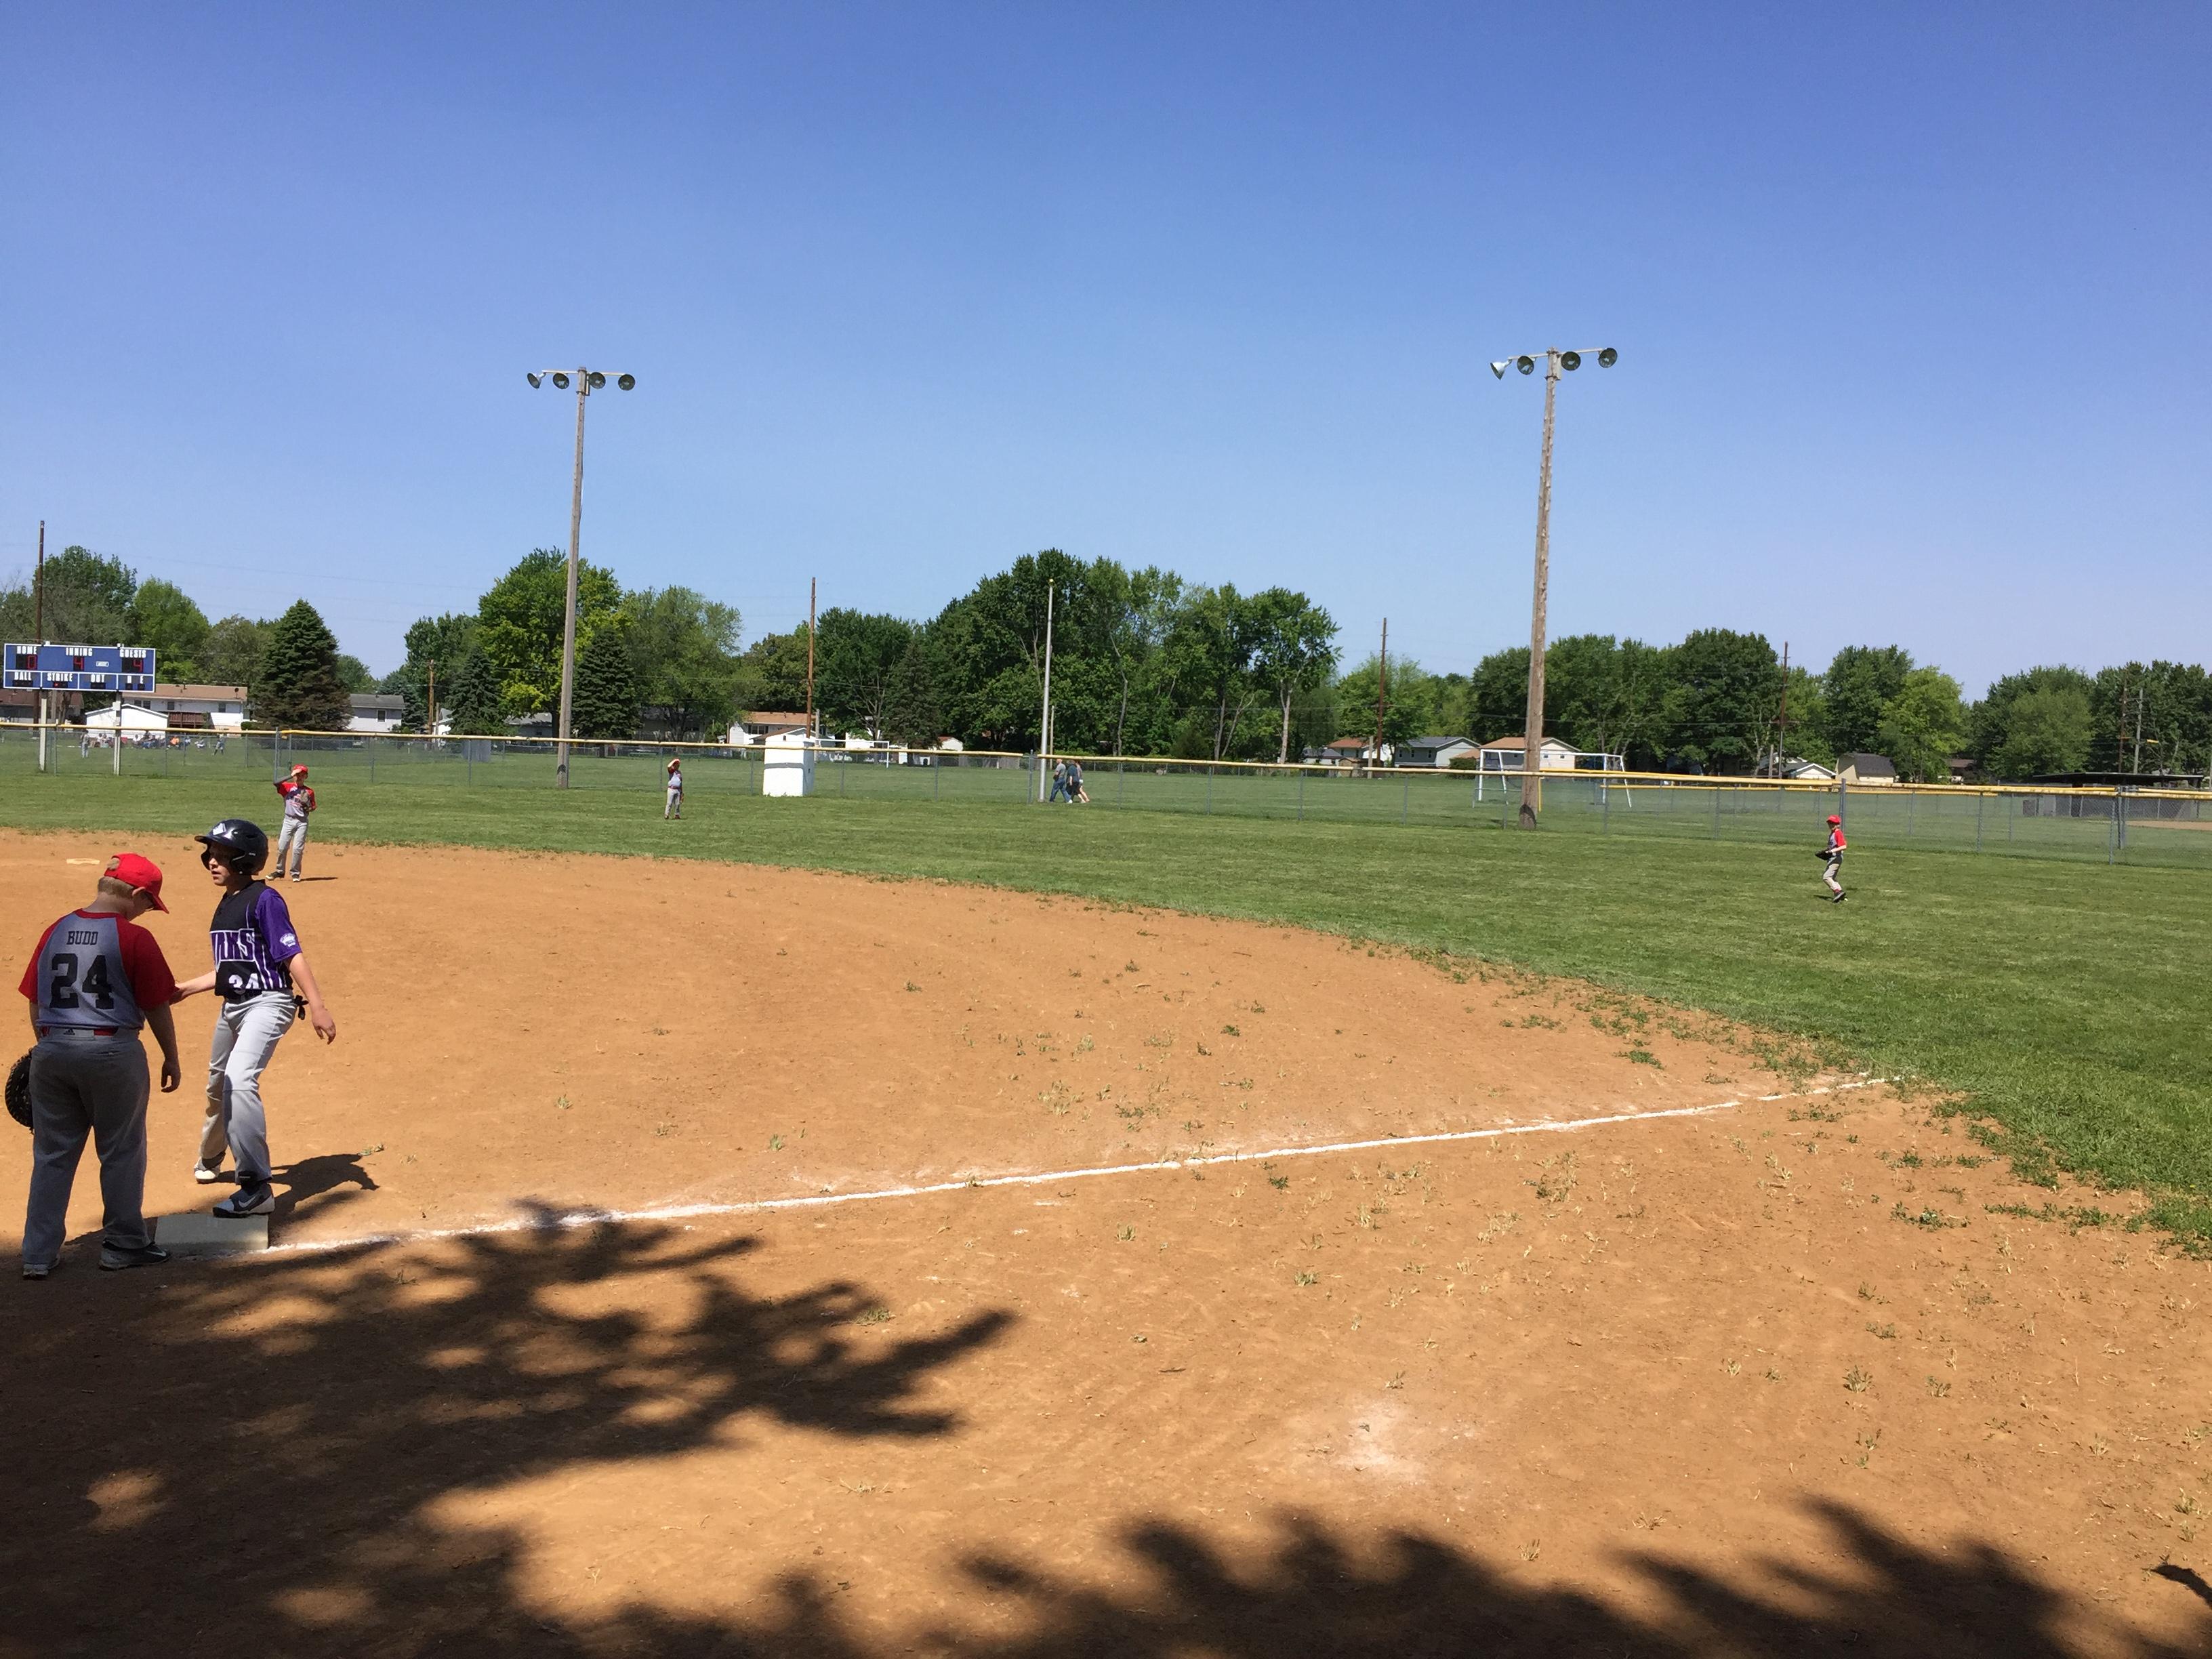 http://217dent.com Team Sponsor, Baseball Team Springfield IL Tournament Game 1 images